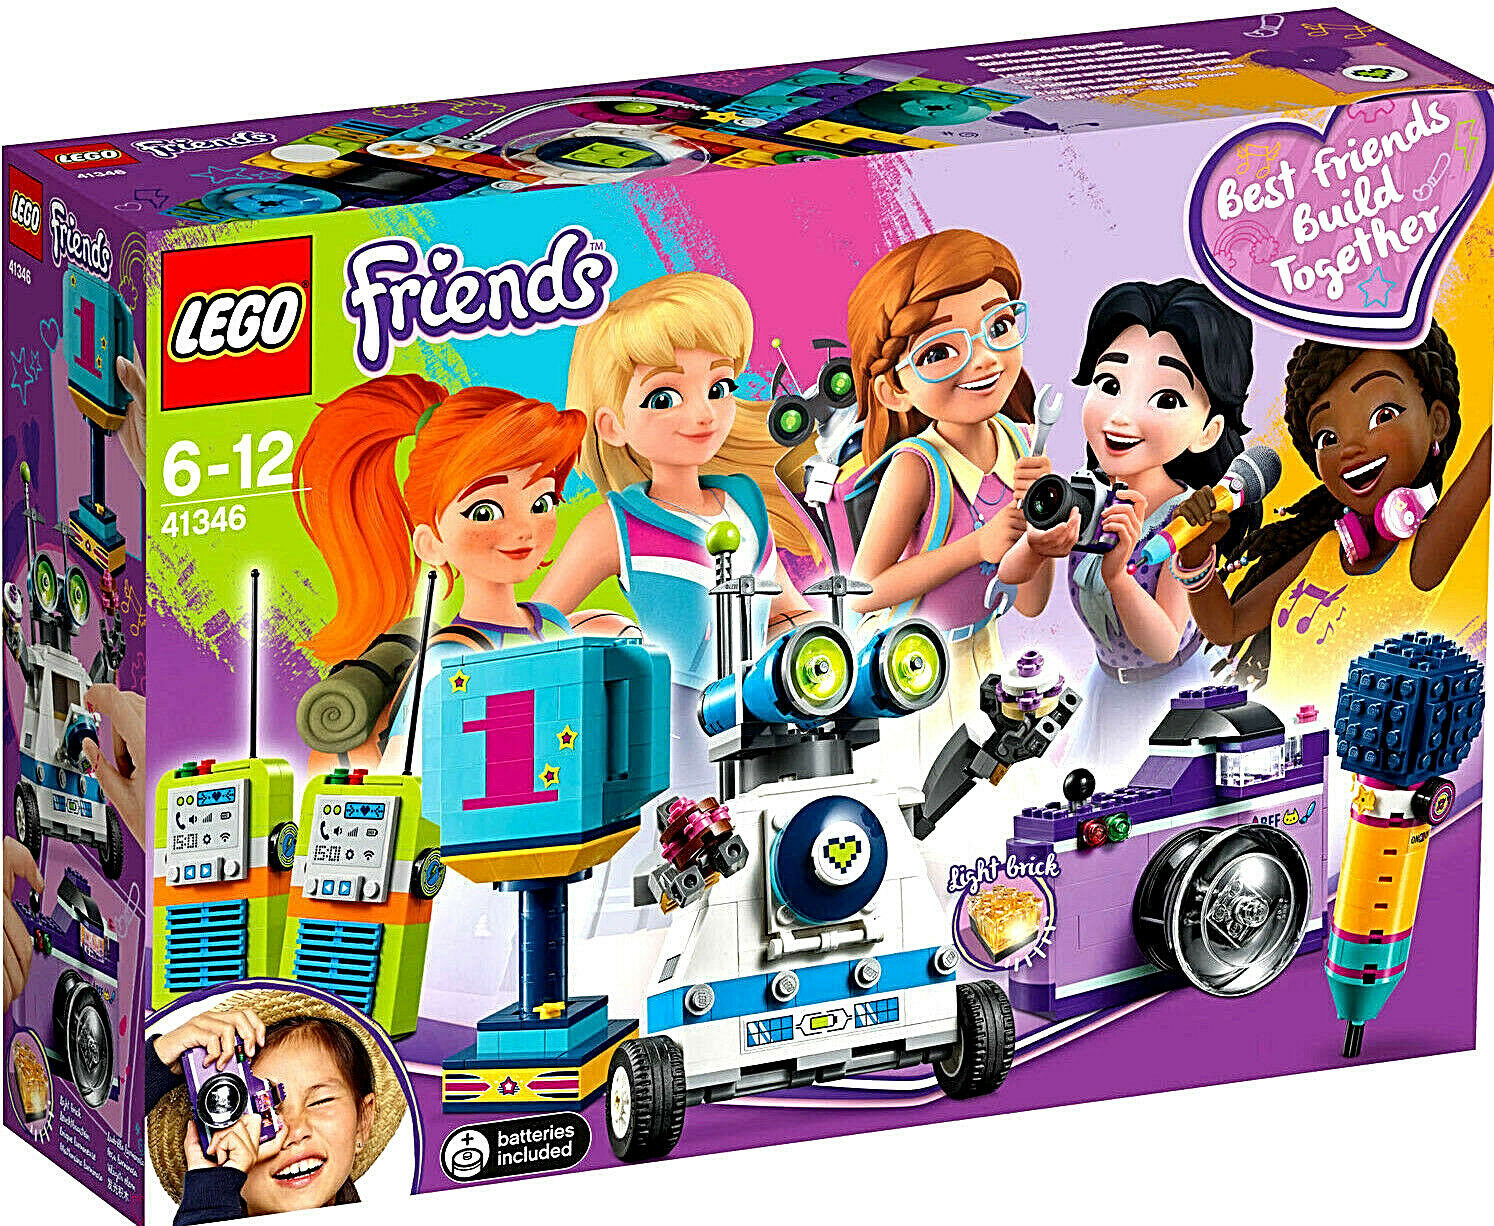 LEGO 41346 Friends Friendship Box,   Five Buildable Accessories   Brand New